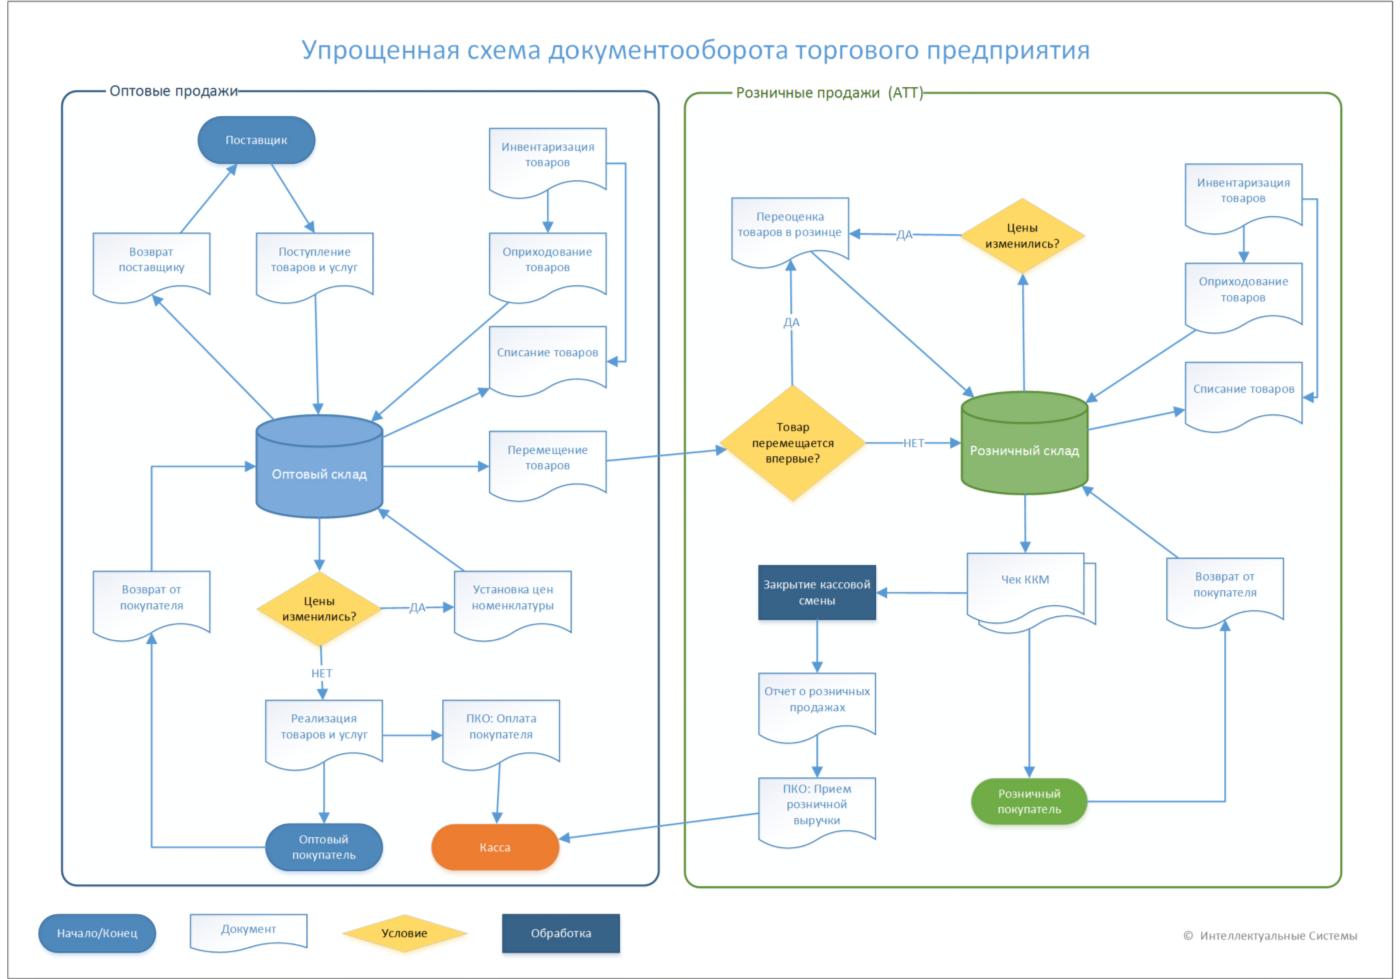 Блок-схема документооборота